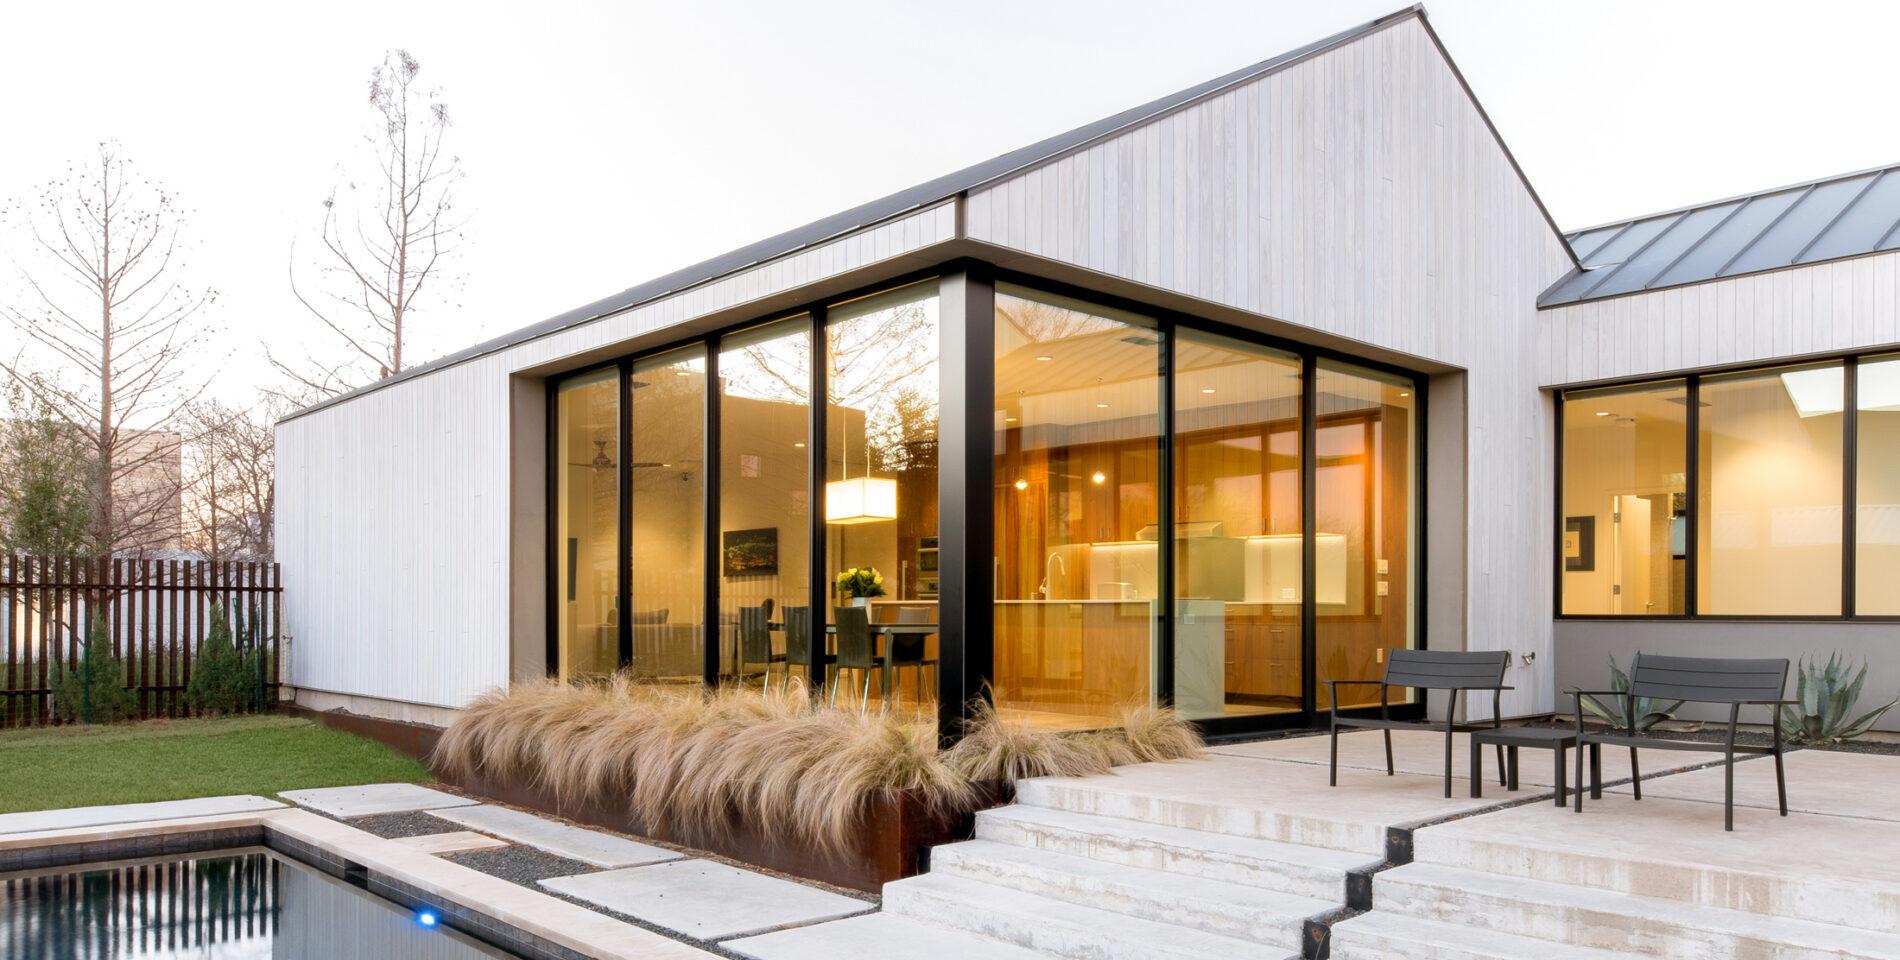 Accoya siding, private residence, Texas home